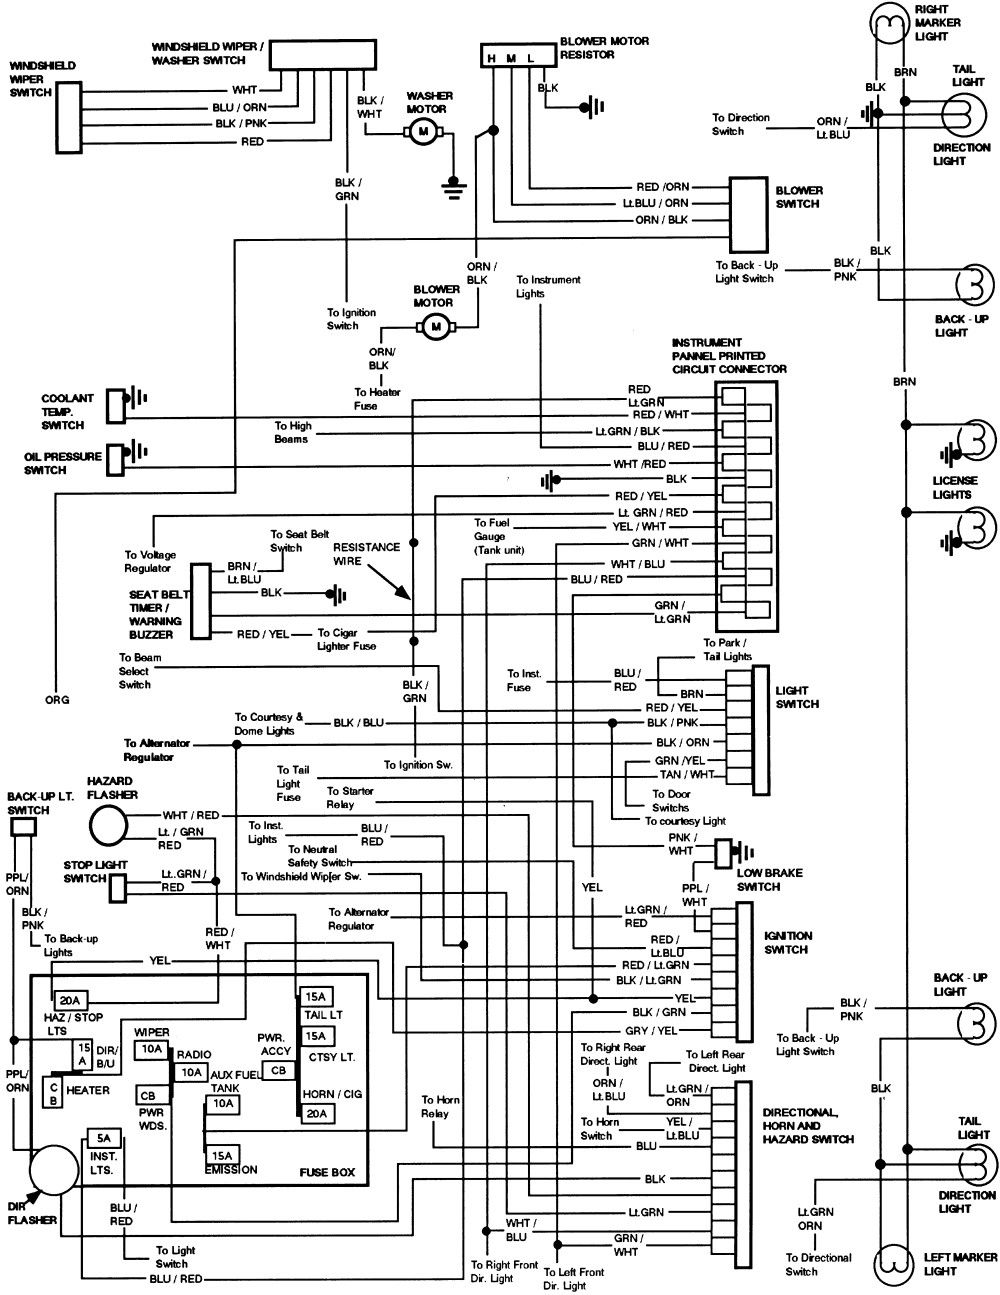 29 Ford Alternator Wiring Diagram Bookingritzcarlton Info Diagram Design Ford F150 Trailer Wiring Diagram